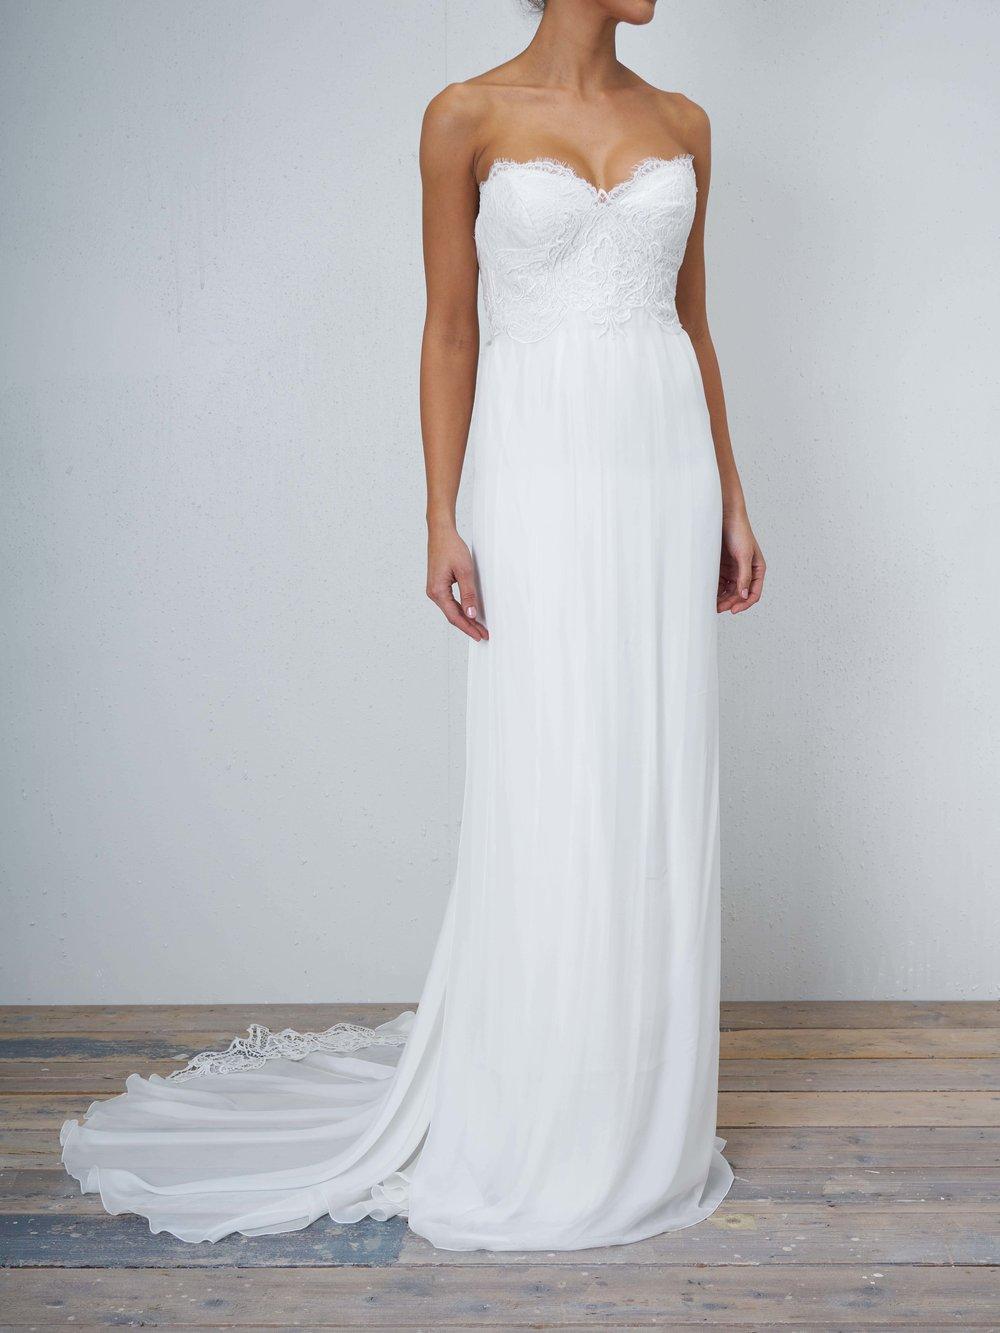 Brooklyn Dress4053edited.jpg